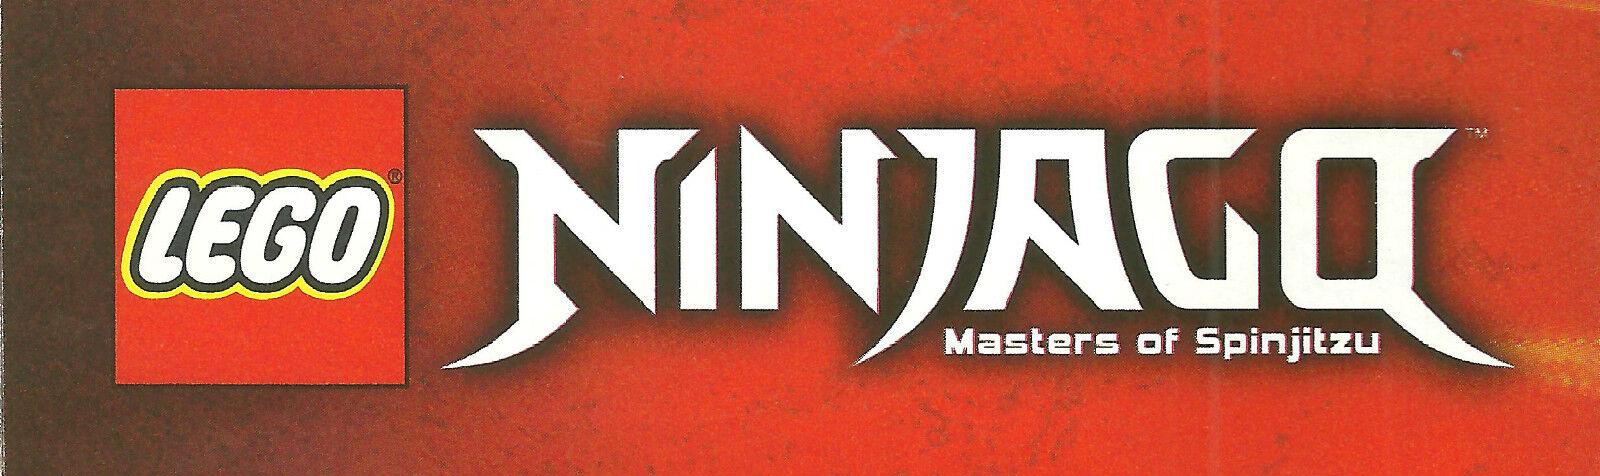 LEGO NINJAGO MASTERS OF SPINJITZU  various sets  available new nuovo